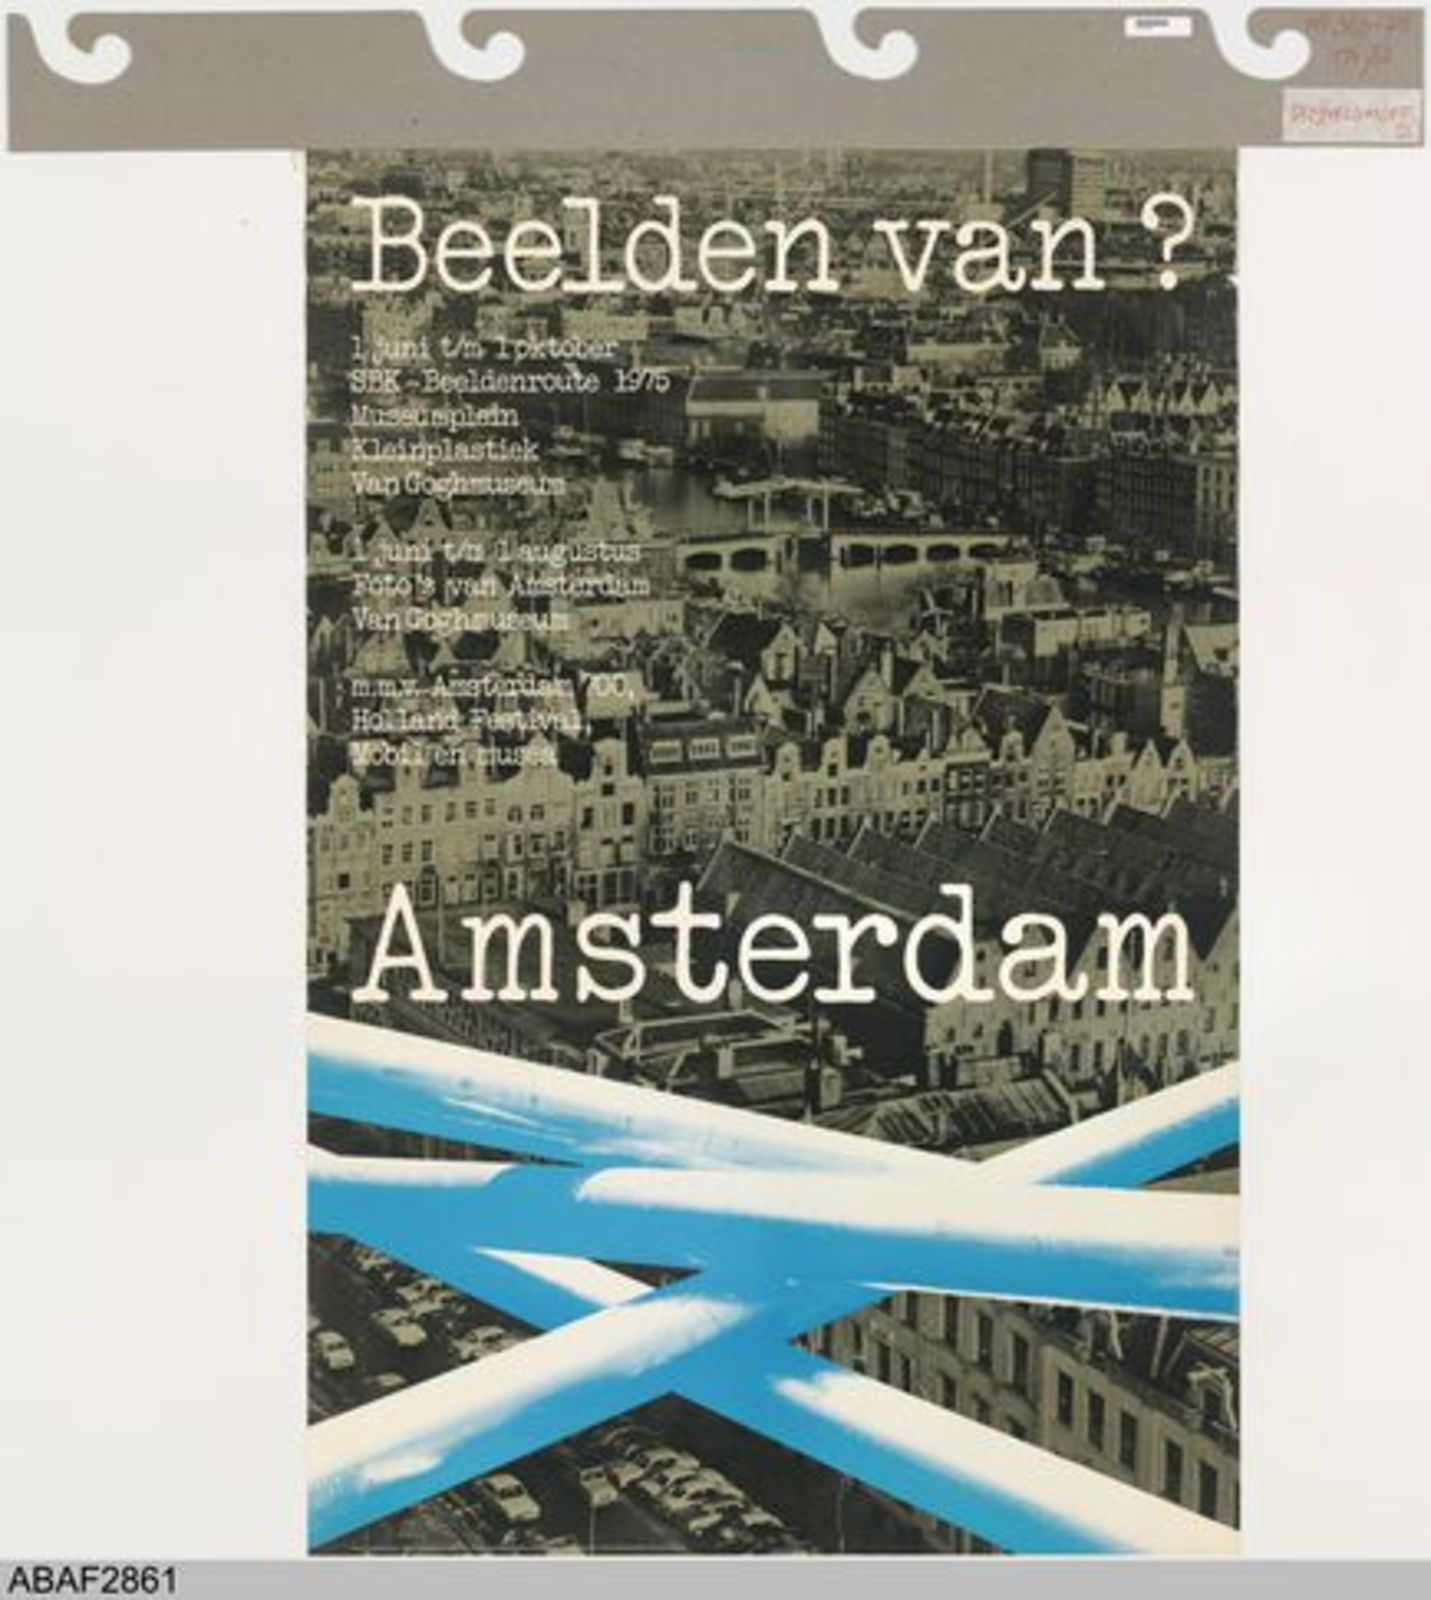 Beelden van? Amsterdam .1 juni t/m 1 oktober SBK- Beeldenroute 1975. Museumplein Kleinplastiek Van Goghmuseum. 1 juni t/m 1 augustus Foto's van Amsterdam, Van Goghmuseum. m.m.v. Amsterdam 700, Holland Festival, Mobil en Musea.